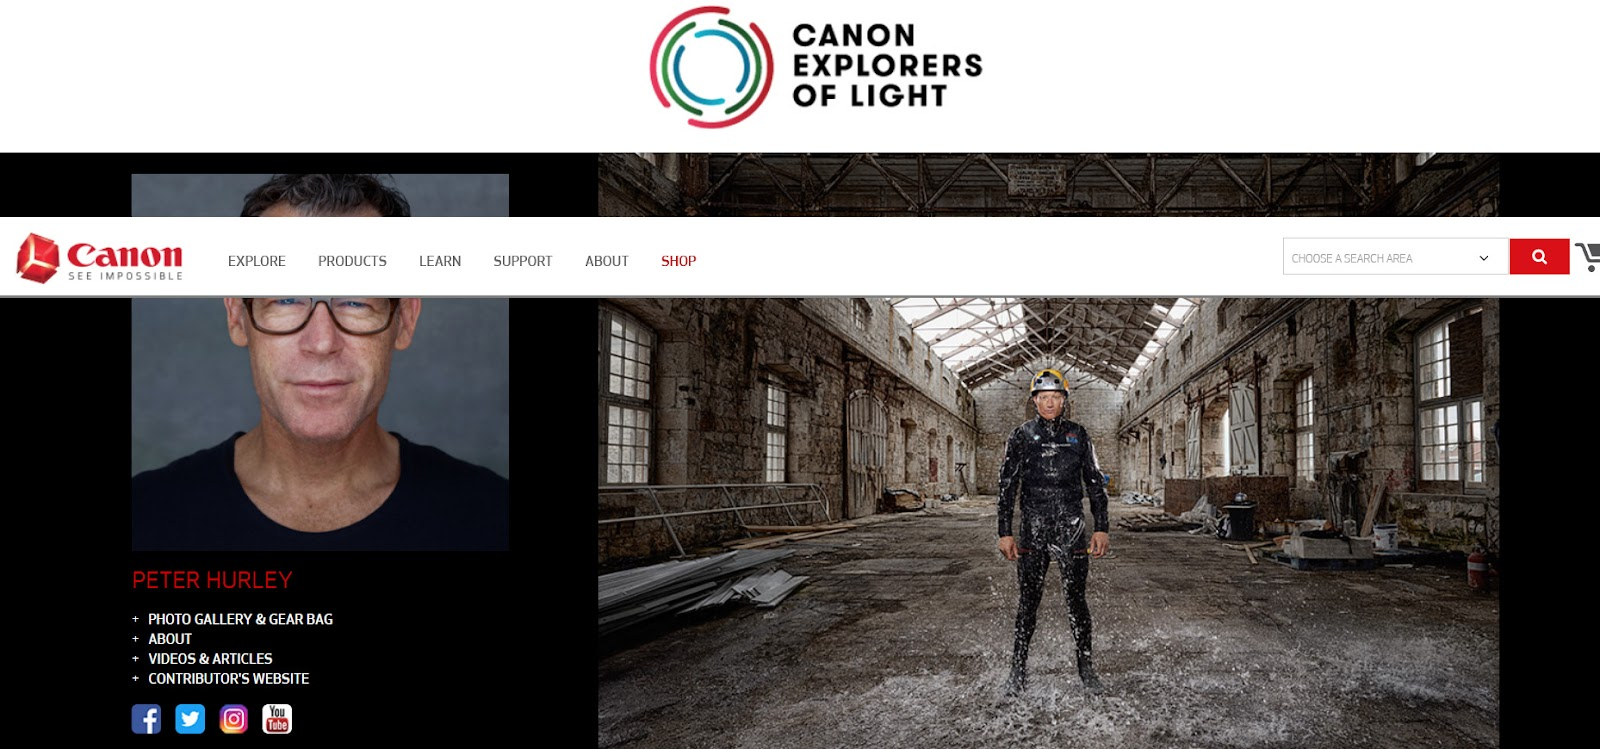 Canon brand ambassador program